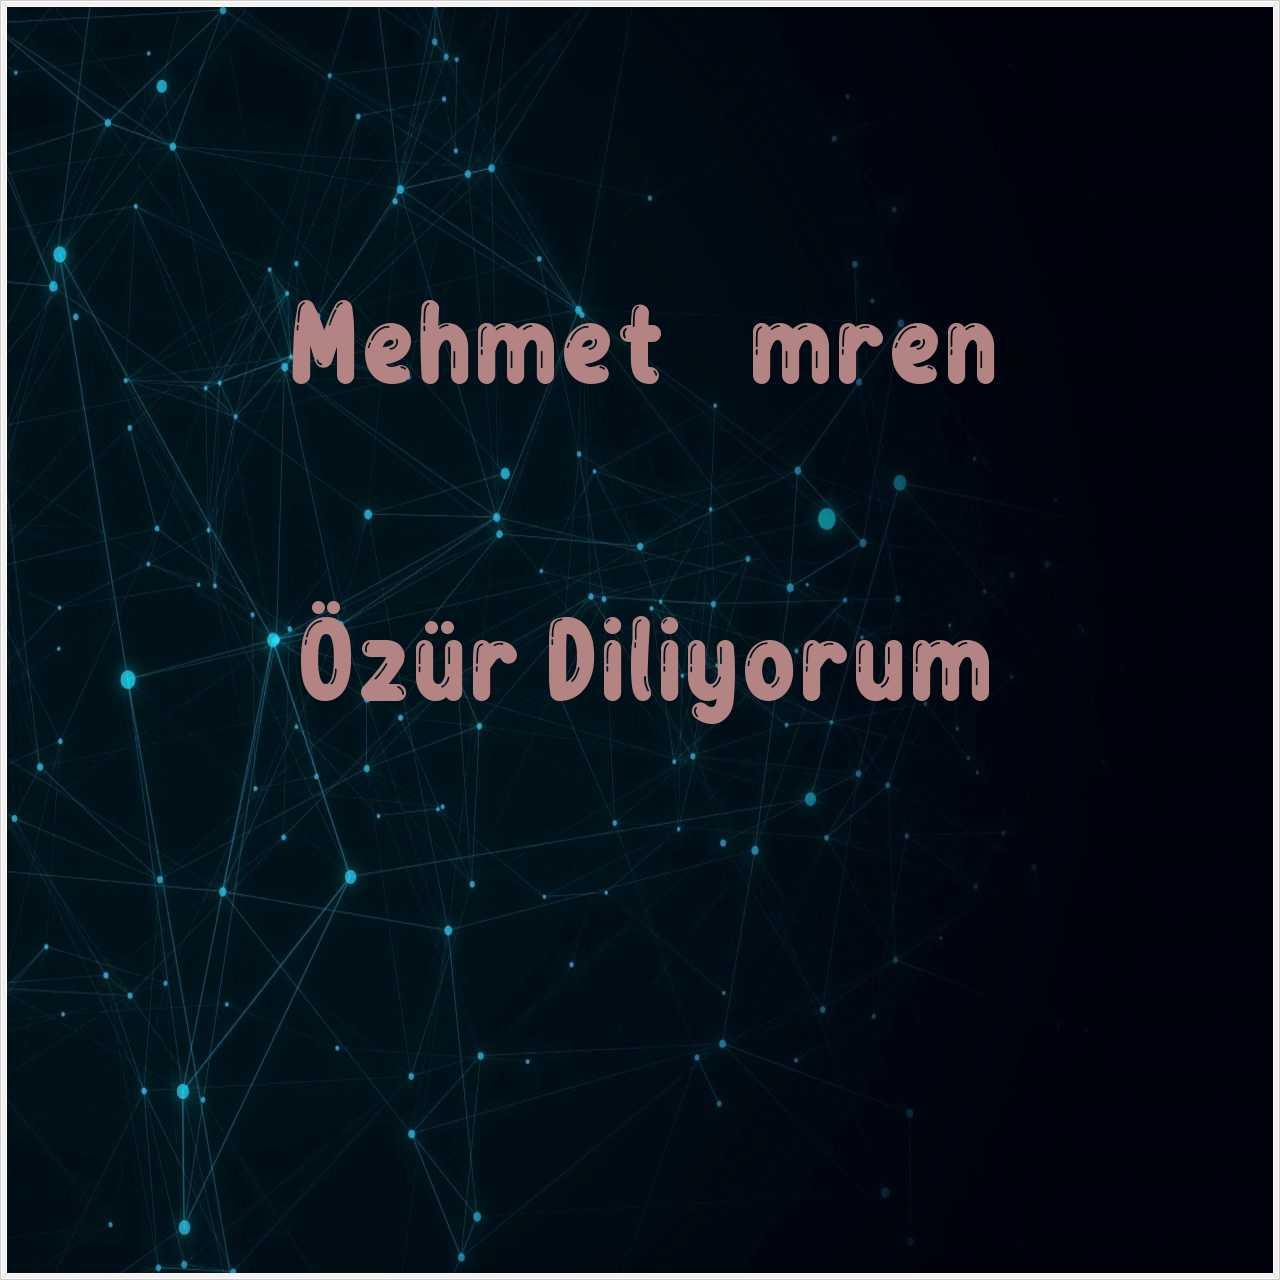 دانلود آهنگ جدید Mehmet İmren به نام Özür Diliyorum